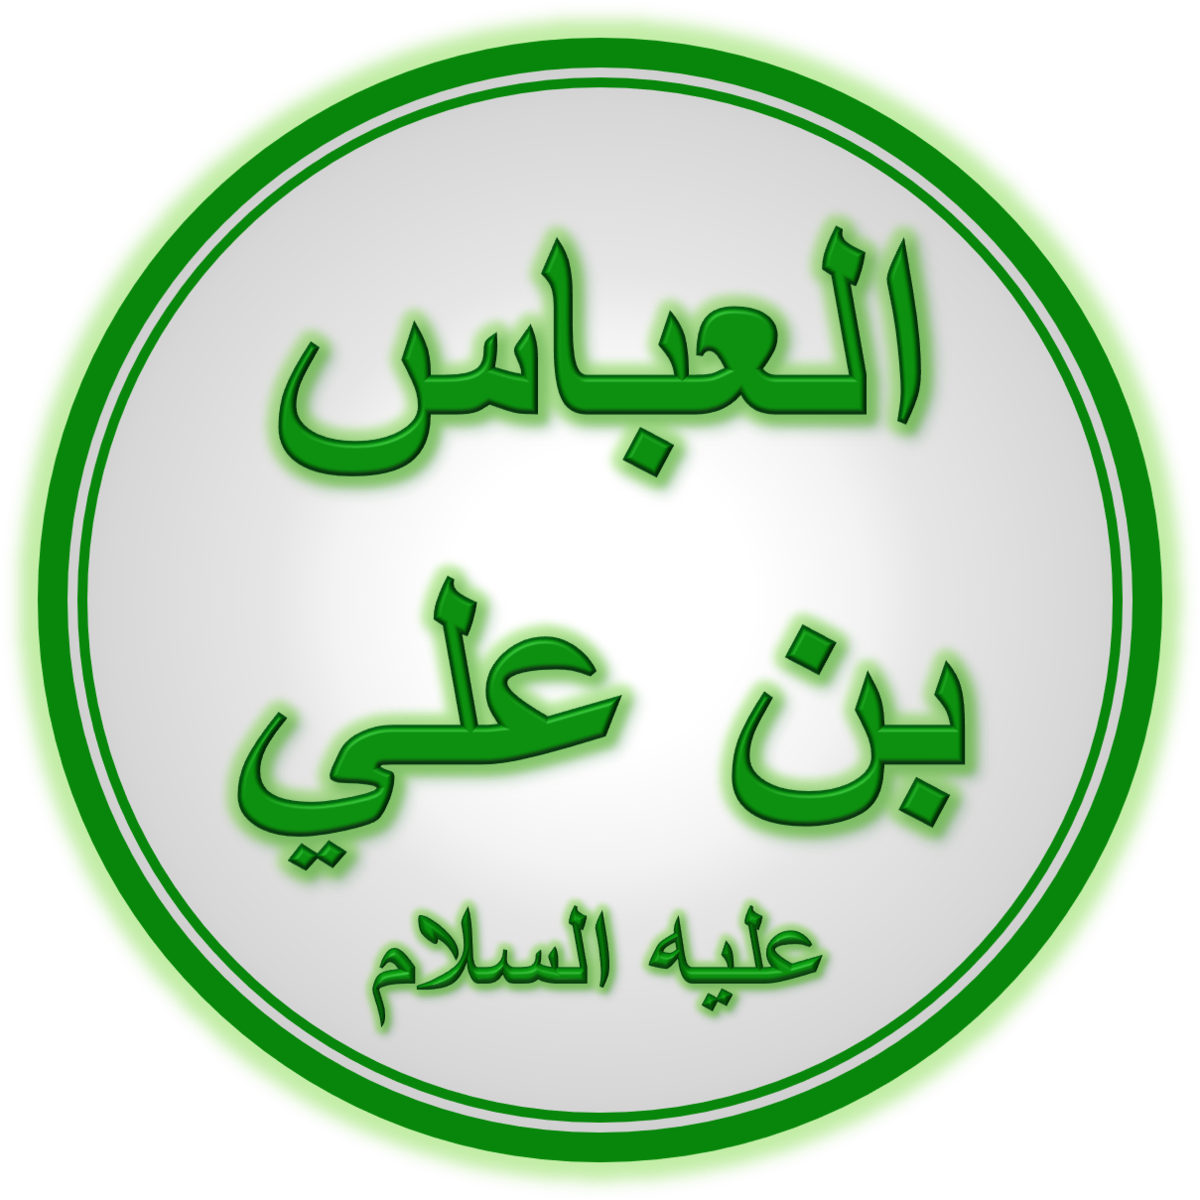 Abbas ibn Ali - Wikipedia